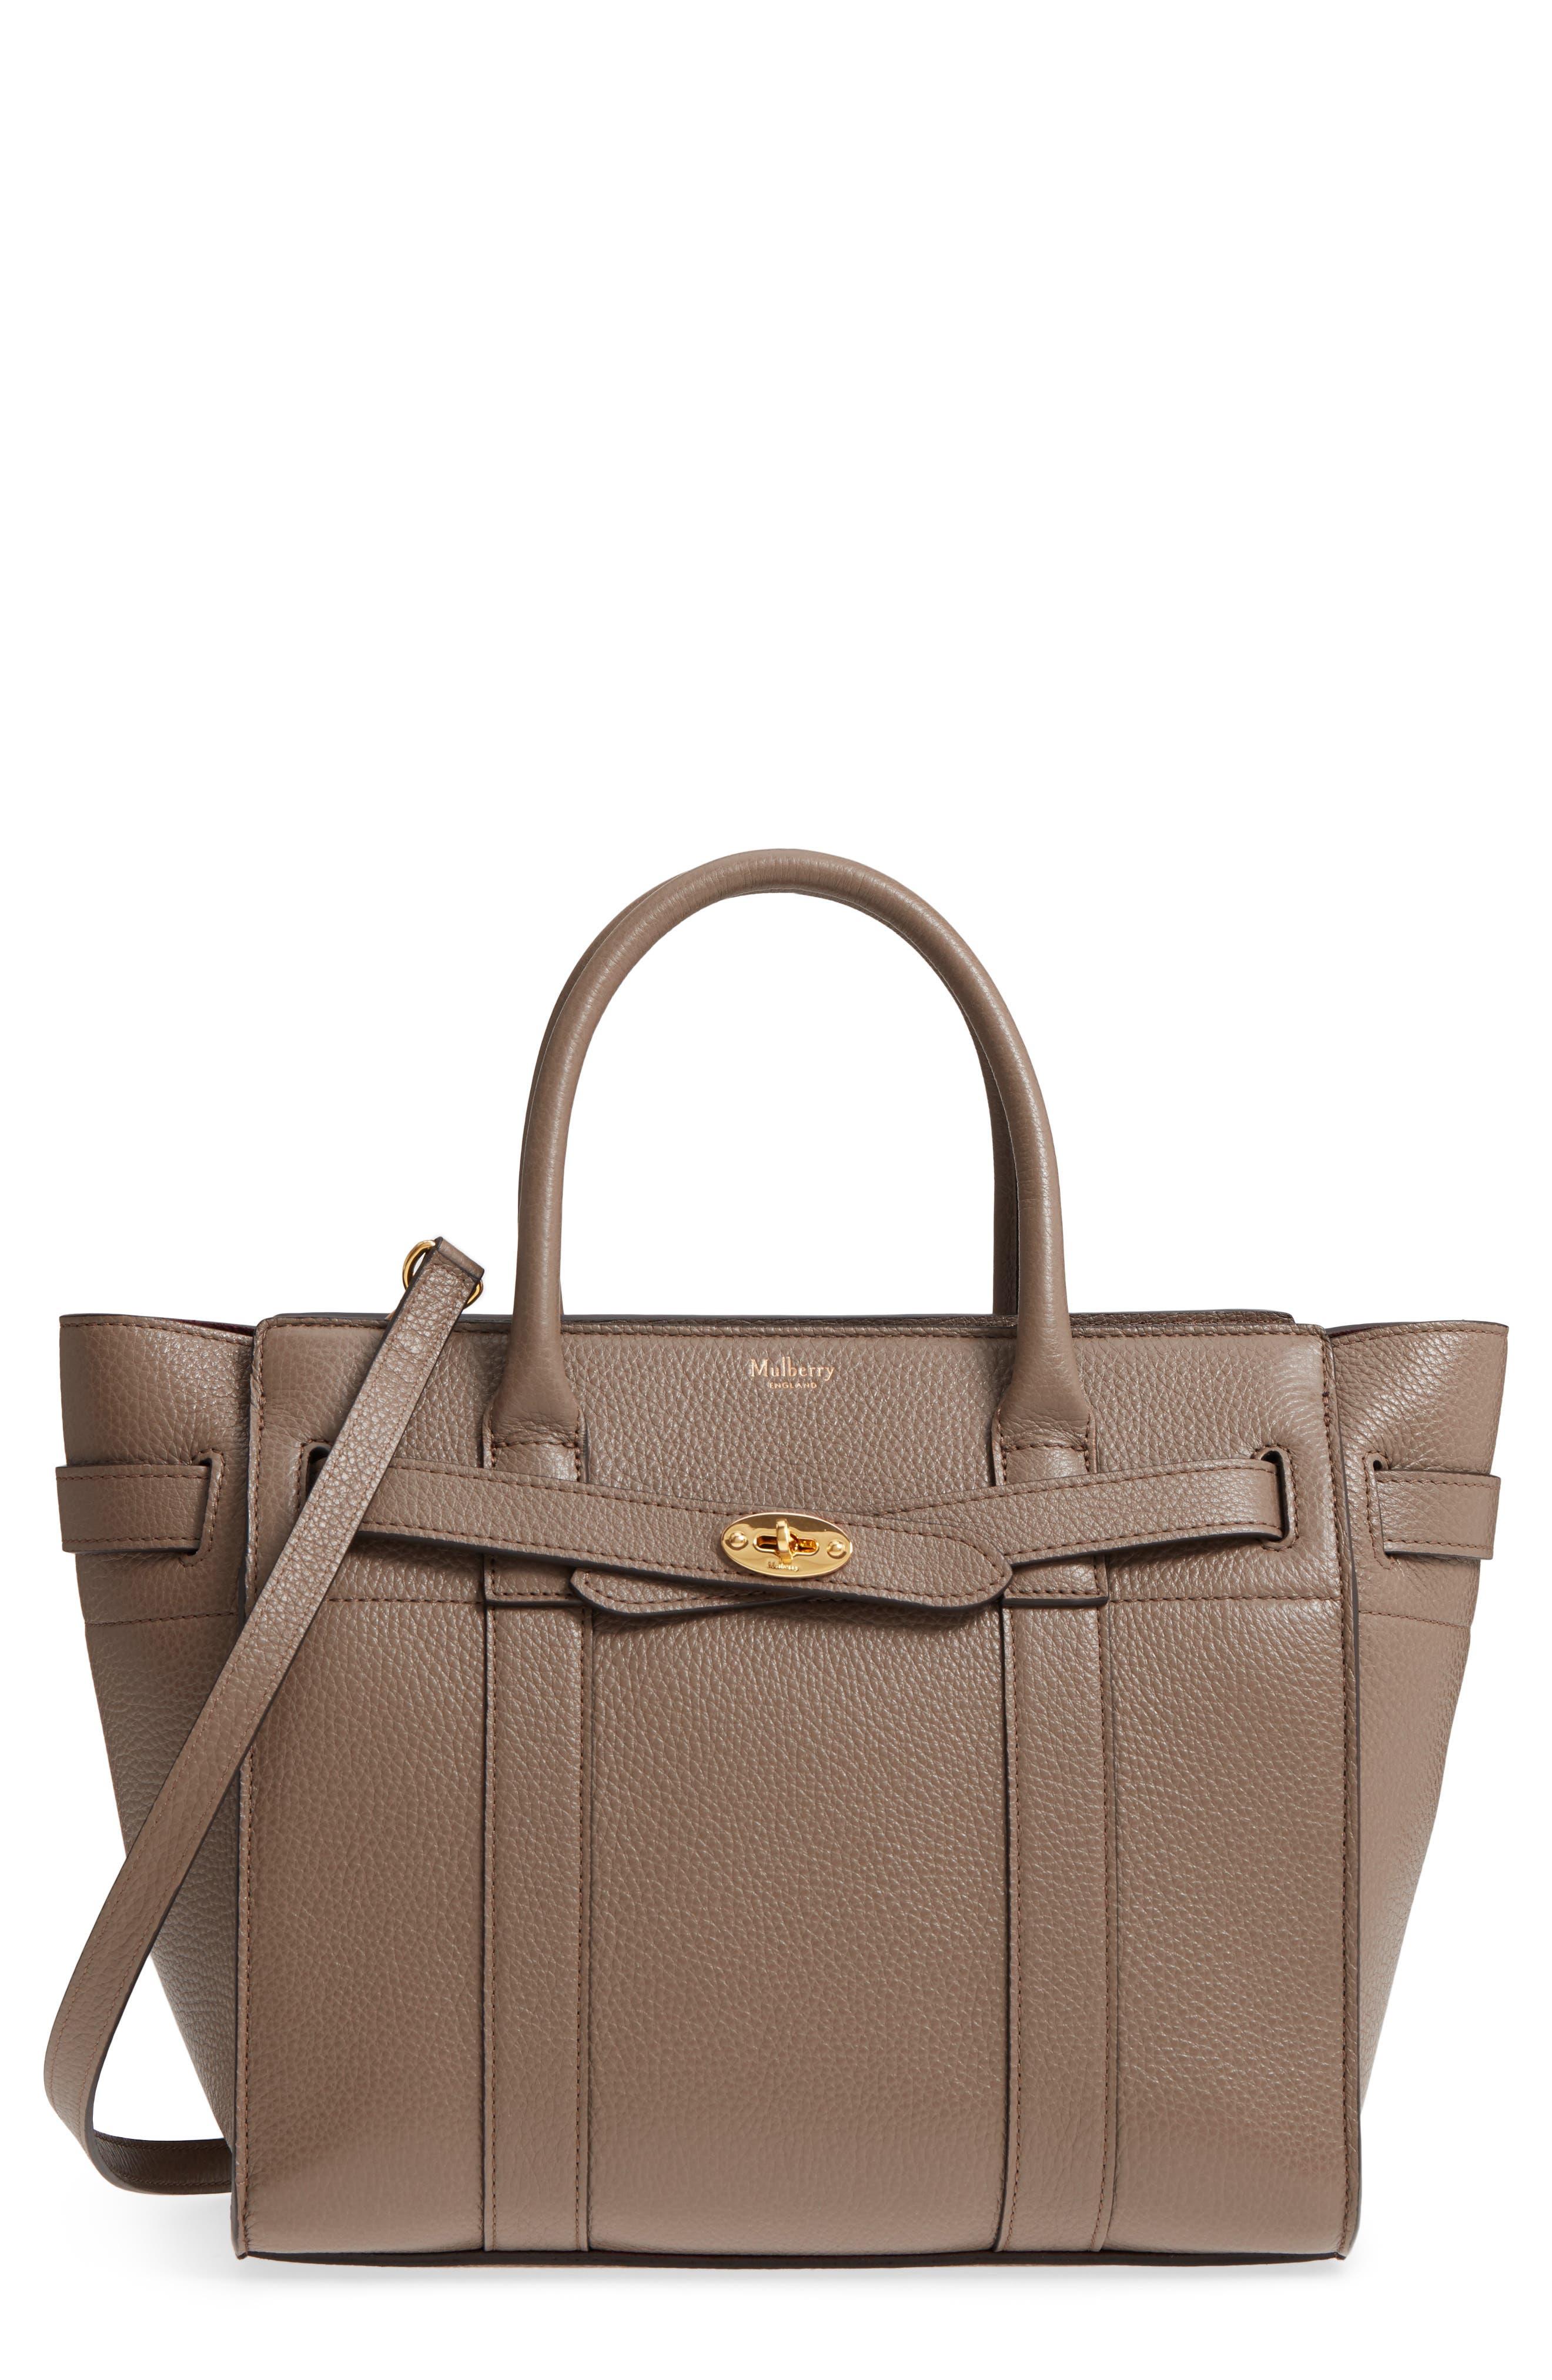 9083e944c94e Mulberry Handbags & Wallets for Women | Nordstrom